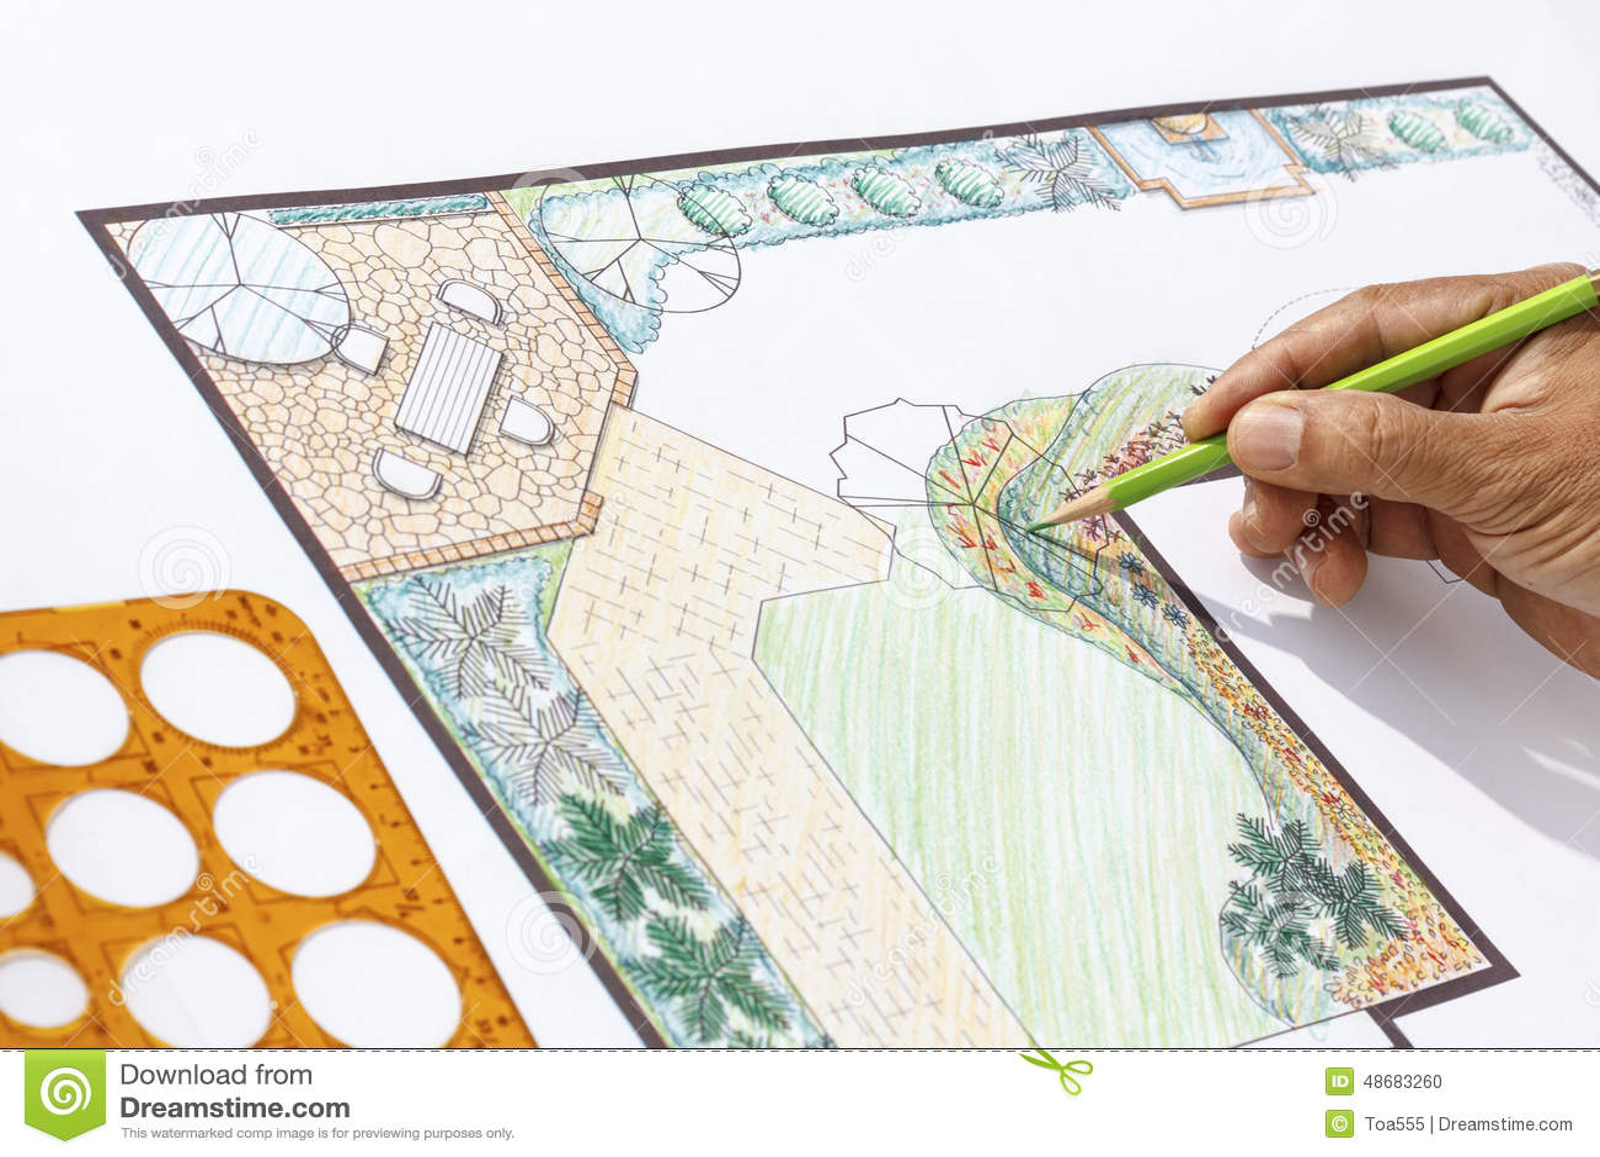 Landscape Architect Design L Shape Garden Plan Stock Photo ... on L Shaped Backyard Layout id=42123